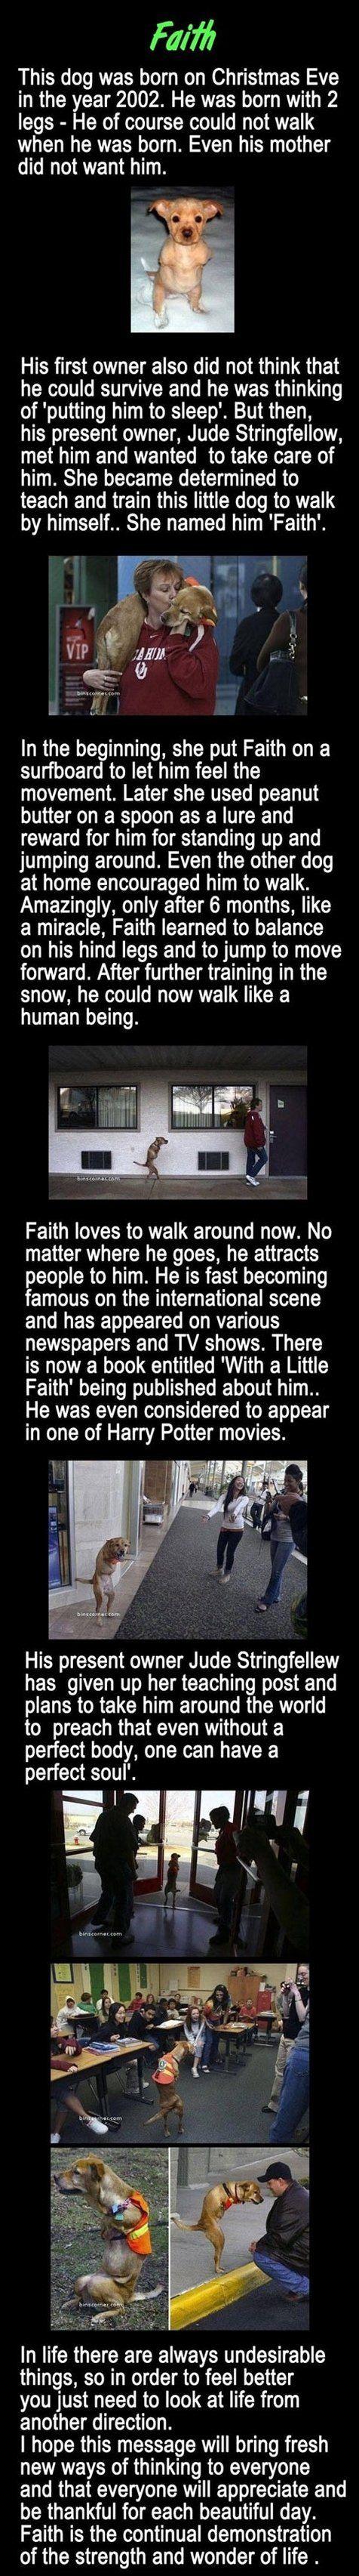 am catholic essay faith i in perseverance still why